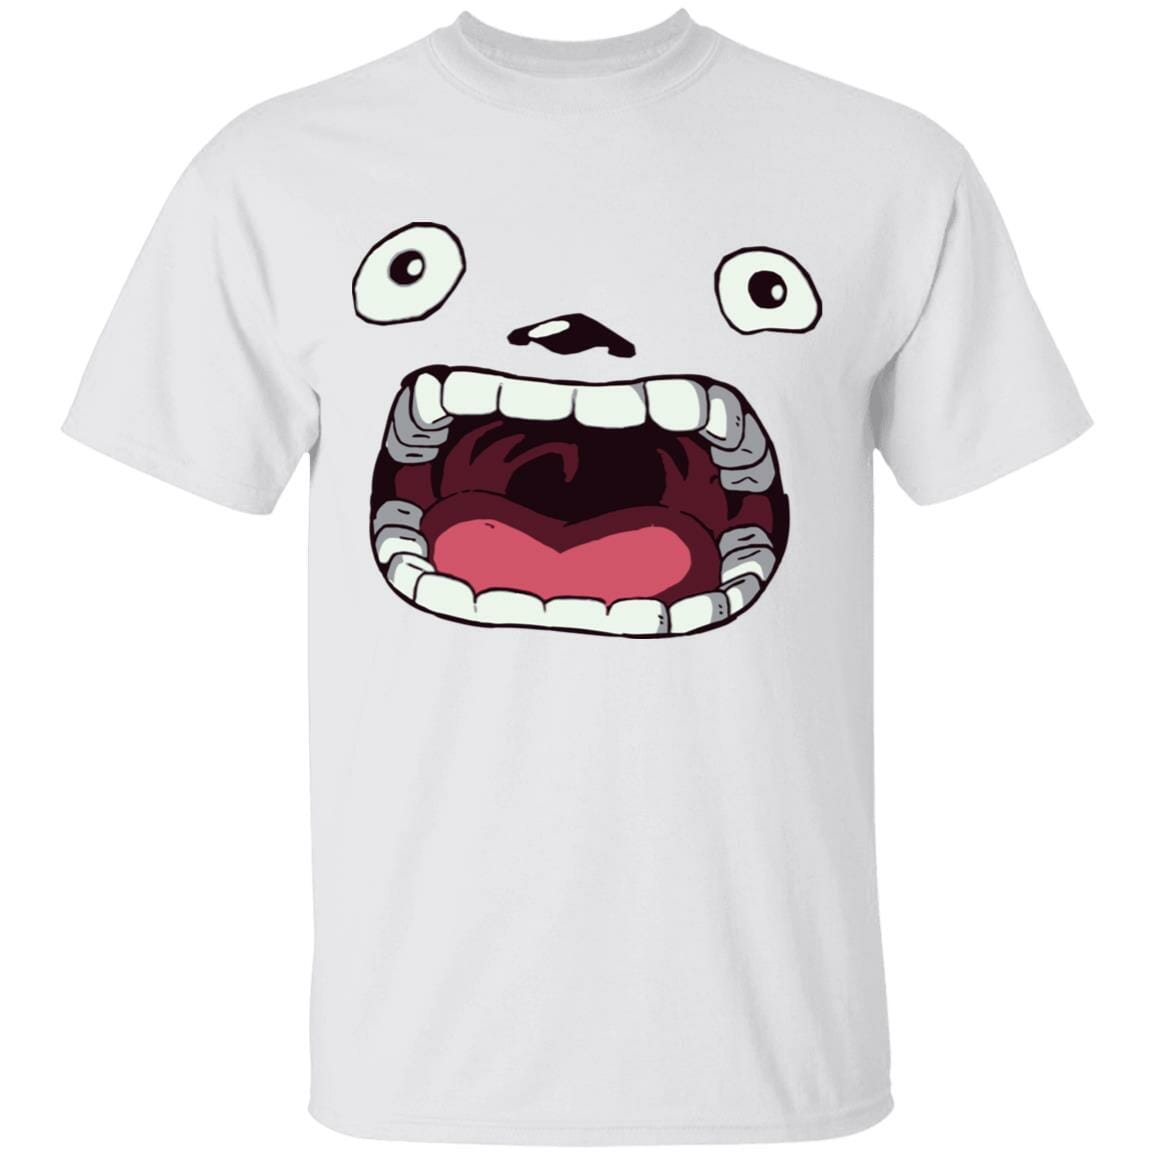 My Neighbor Totoro – Big Mouth T Shirt